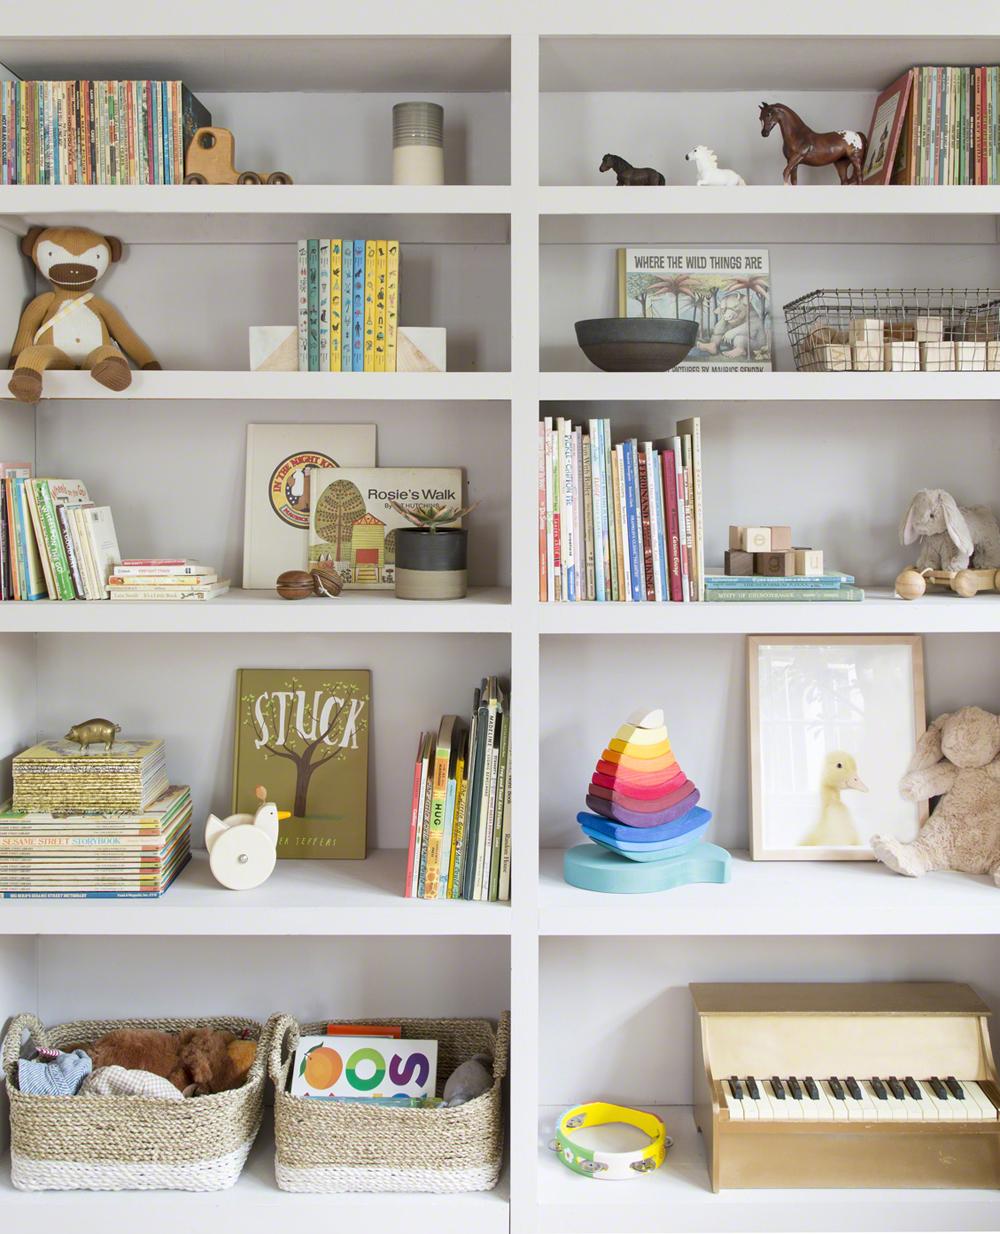 baby-rhino-nursery-design-storage-www.theanimalprintshop.com-02